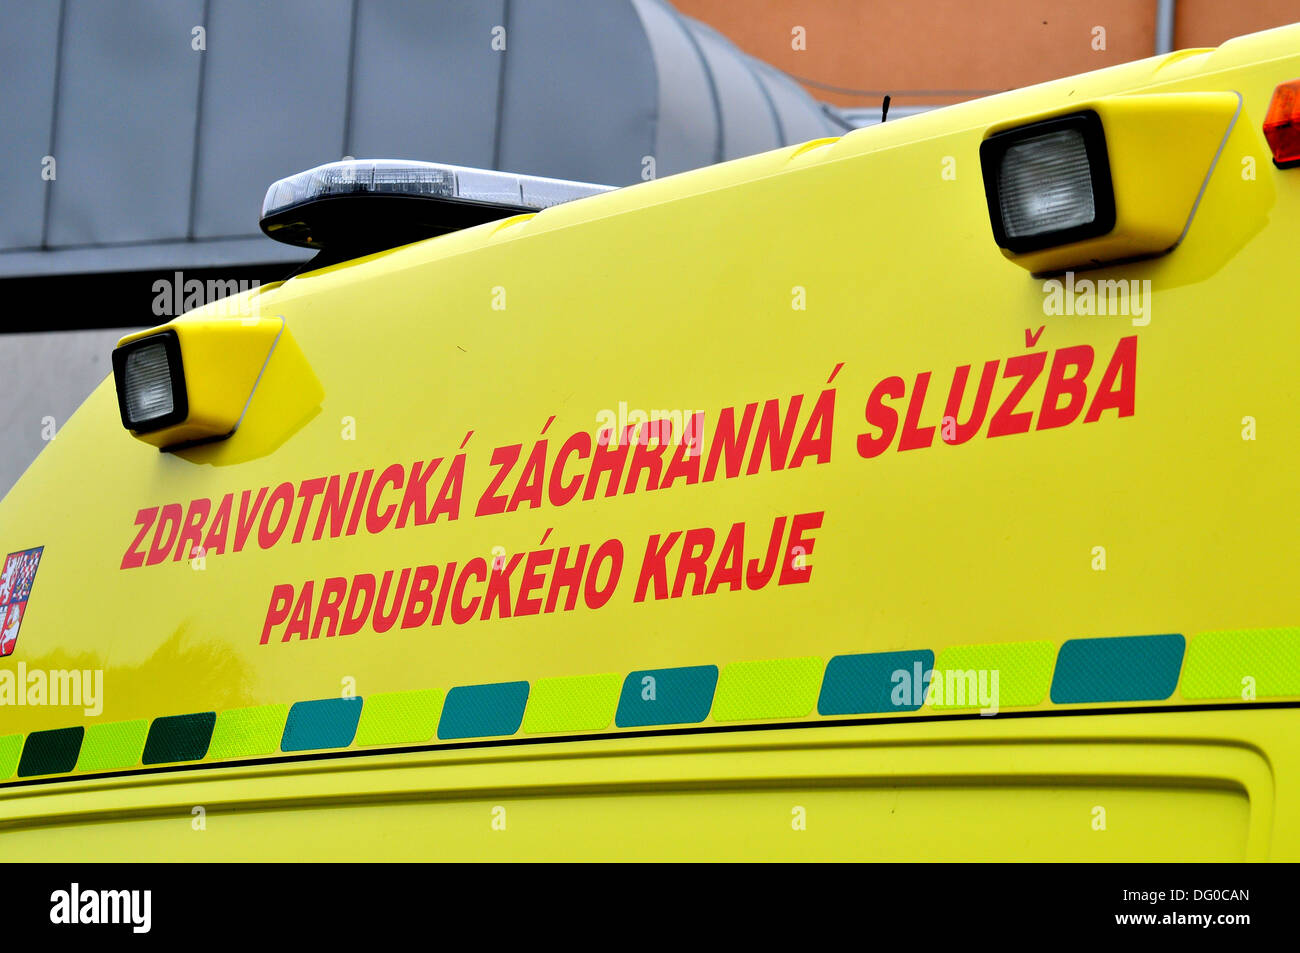 auto, car, vehicle, ambulance, ambulance service, 155, first aid, doctor, ARO - Stock Image